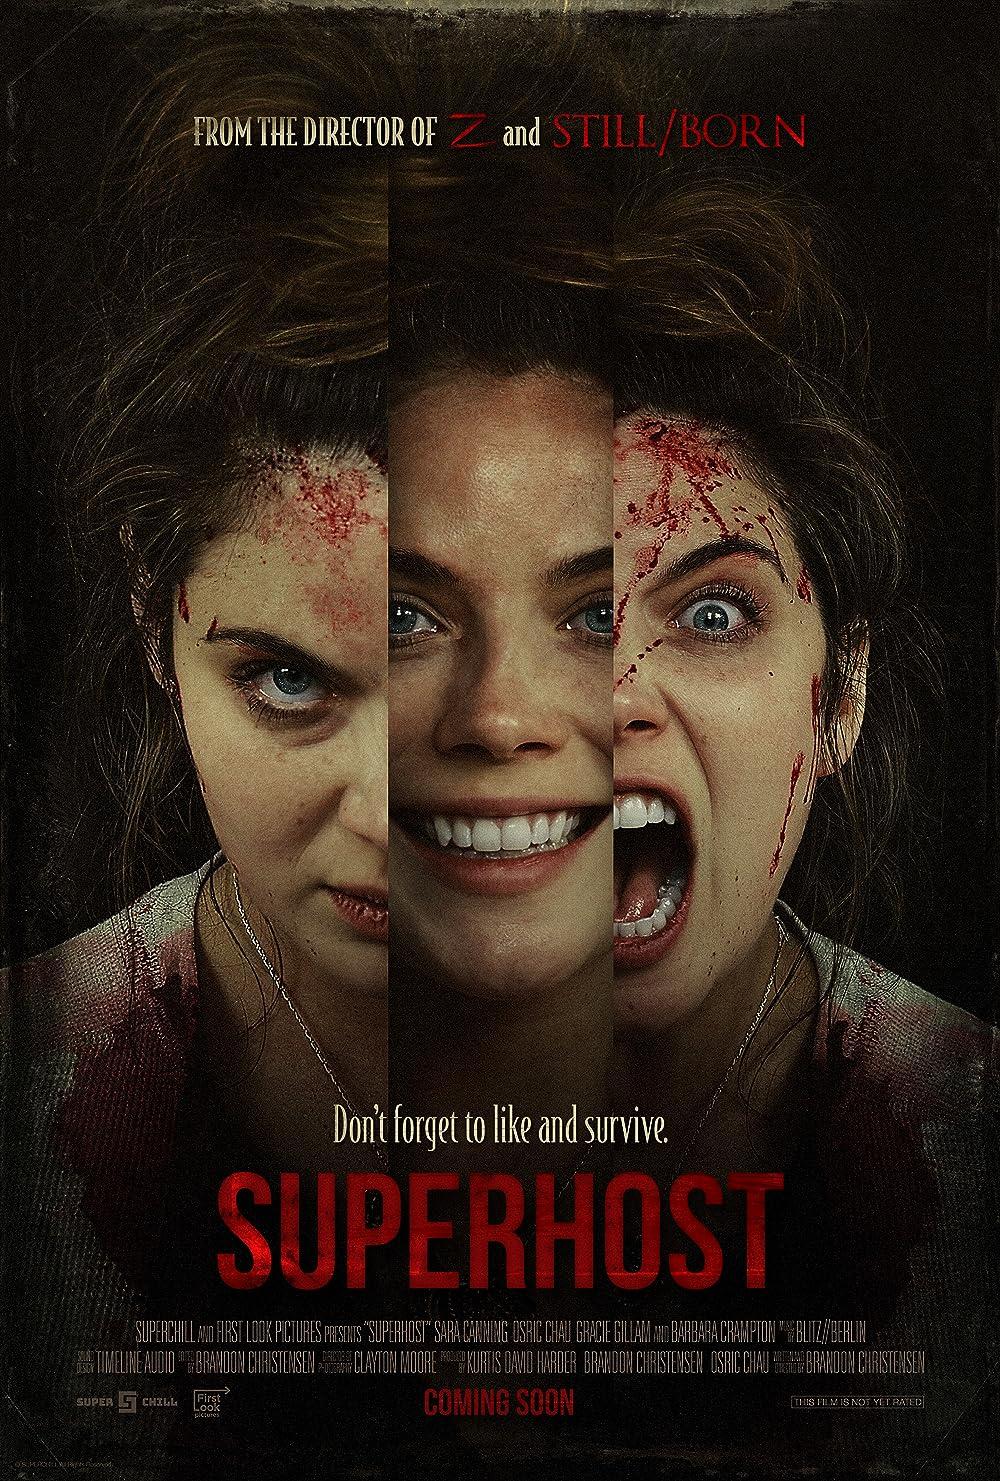 Superhost (2021) Bengali Dubbed (Voice Over) WEBRip 720p [Full Movie] 1XBET